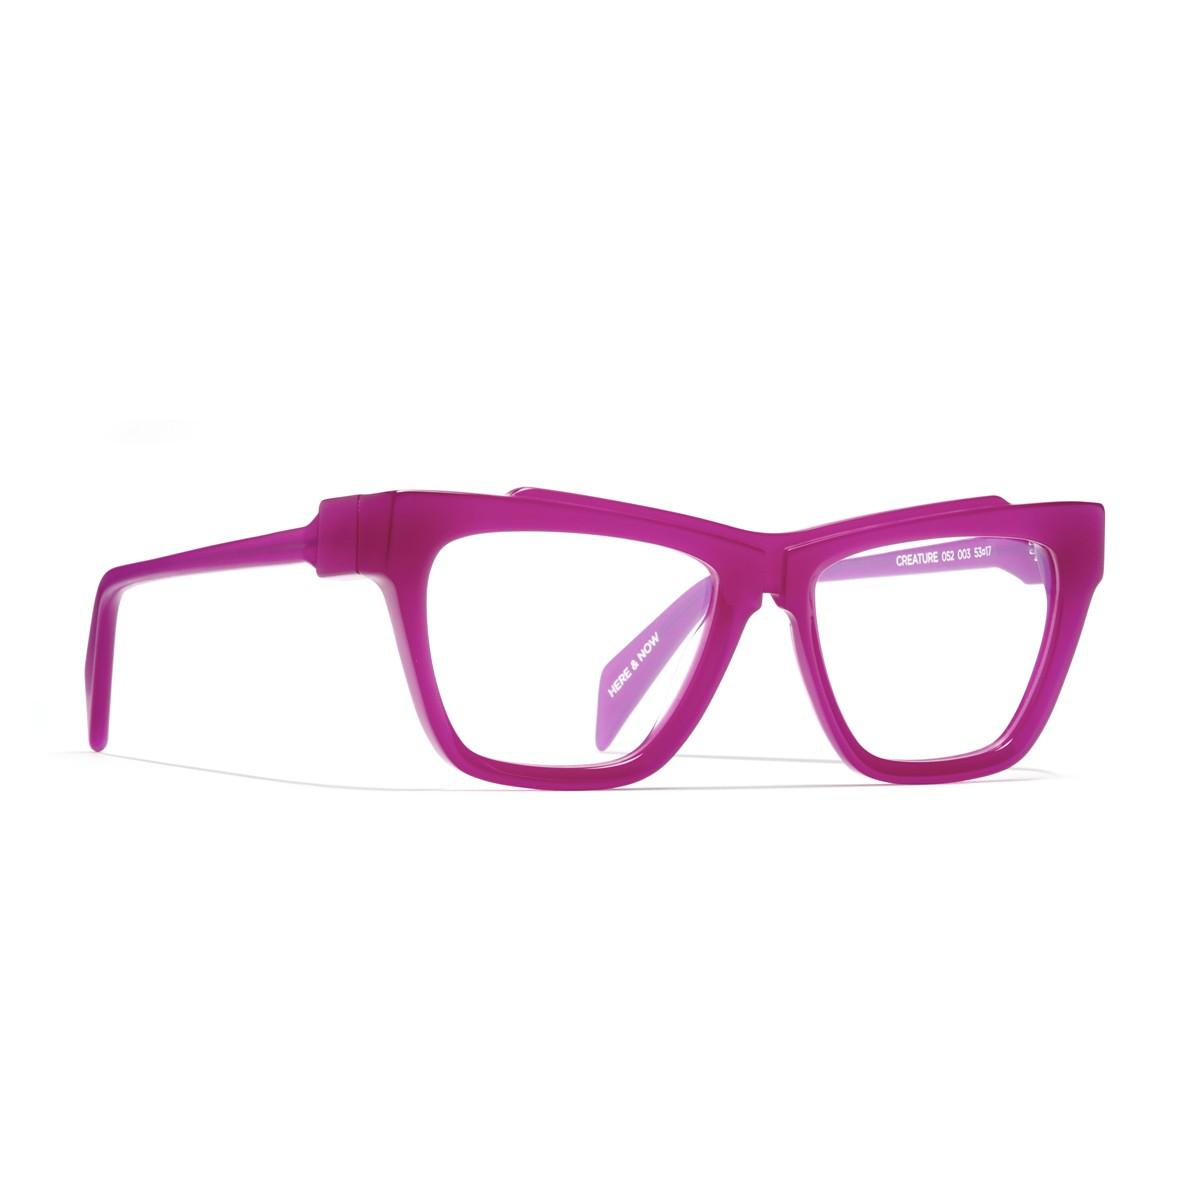 Siens Eye code 052 | Occhiali da vista Donna